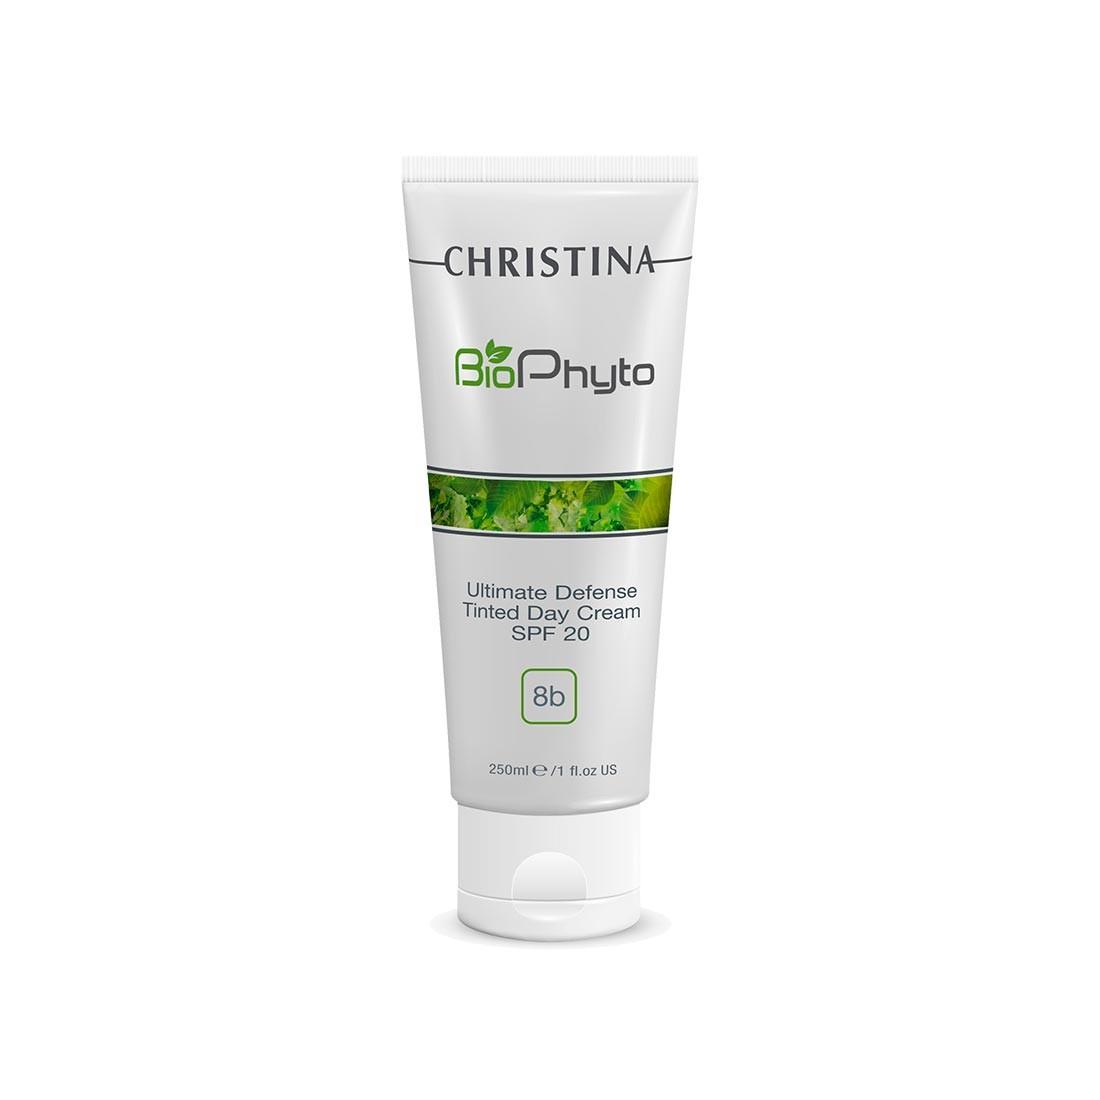 Christina Дневной крем Абсолютная защита SPF 20 с тоном Bio Phyto Ultimate Defense Tinted Day Cream SPF 250 мл